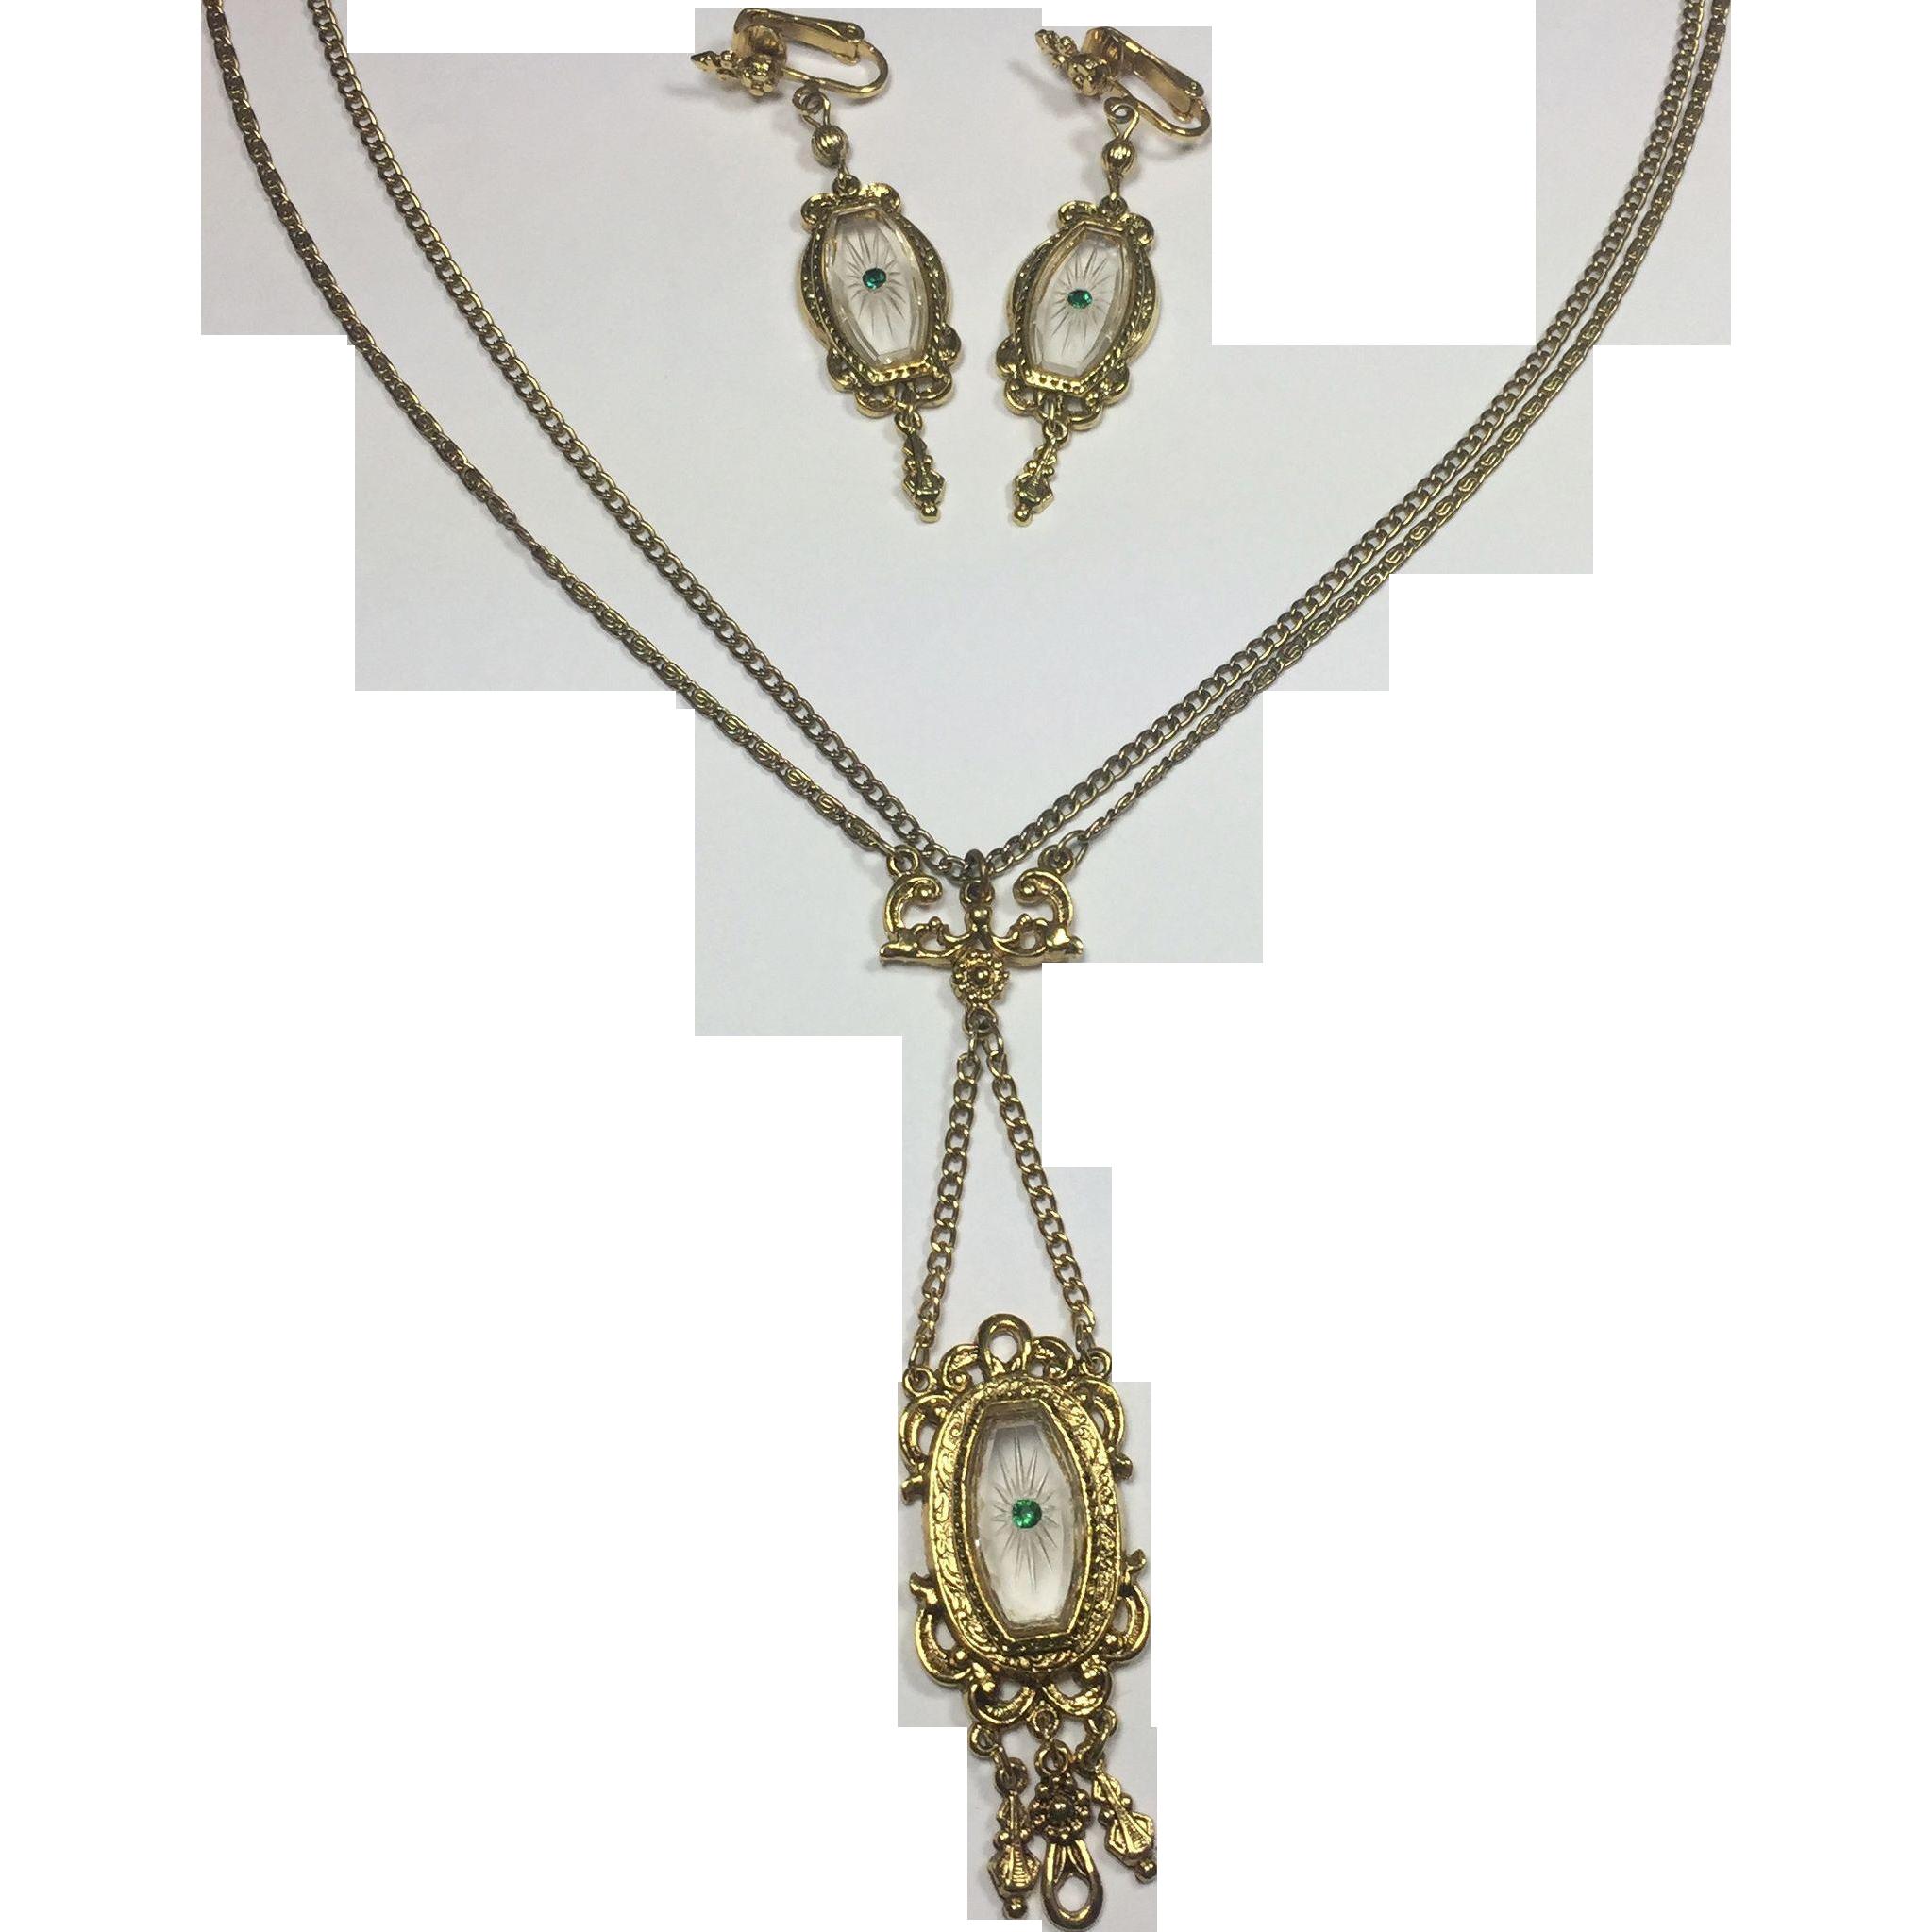 Victorian Nouveau Style Festoon Pendant Necklace & Earrings by ART